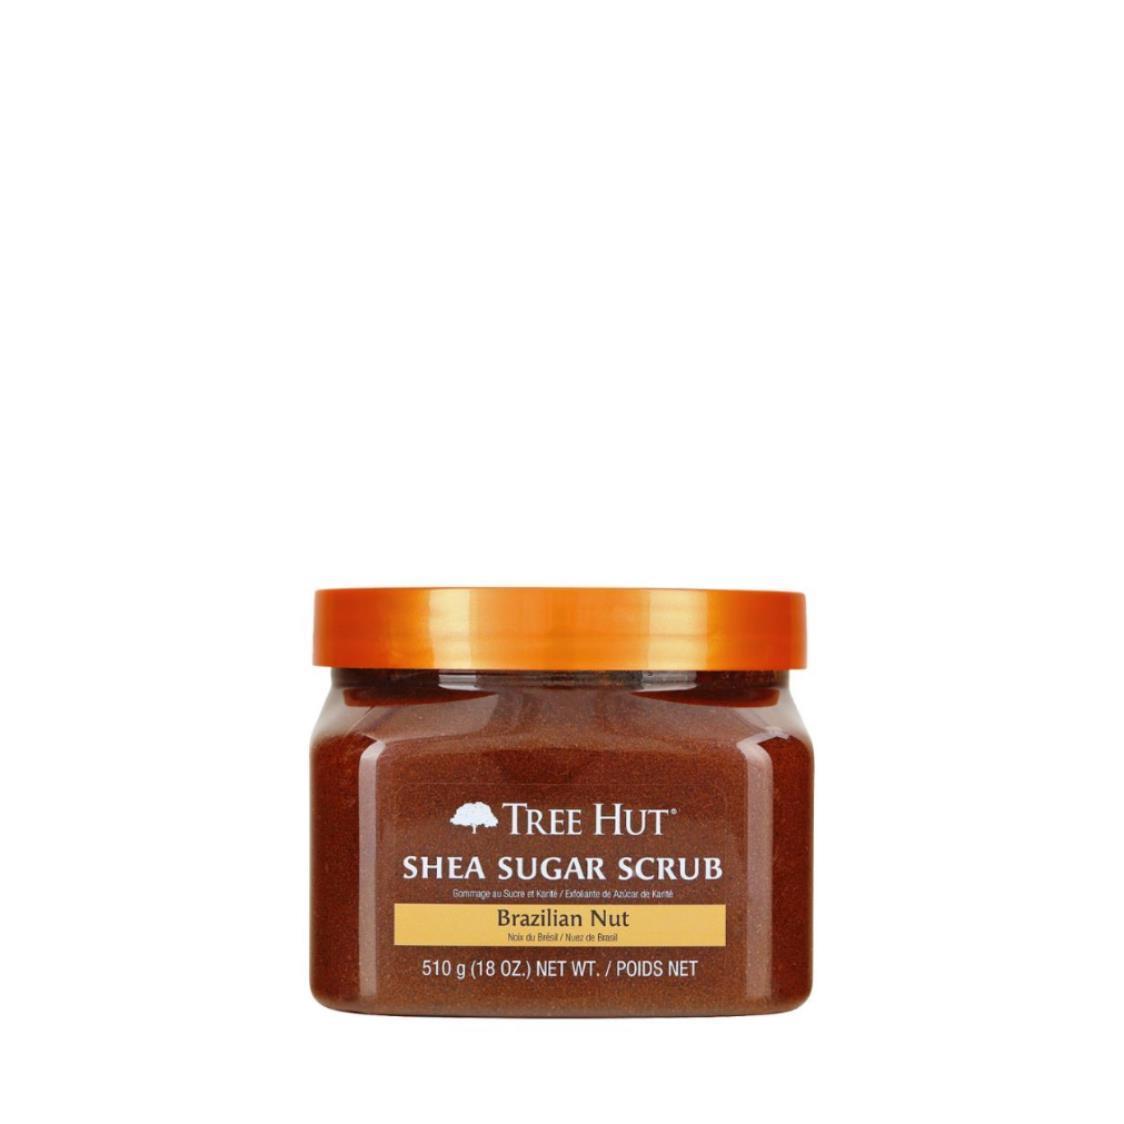 Shea Sugar Scrub Brazilian Nut 18oz 510g